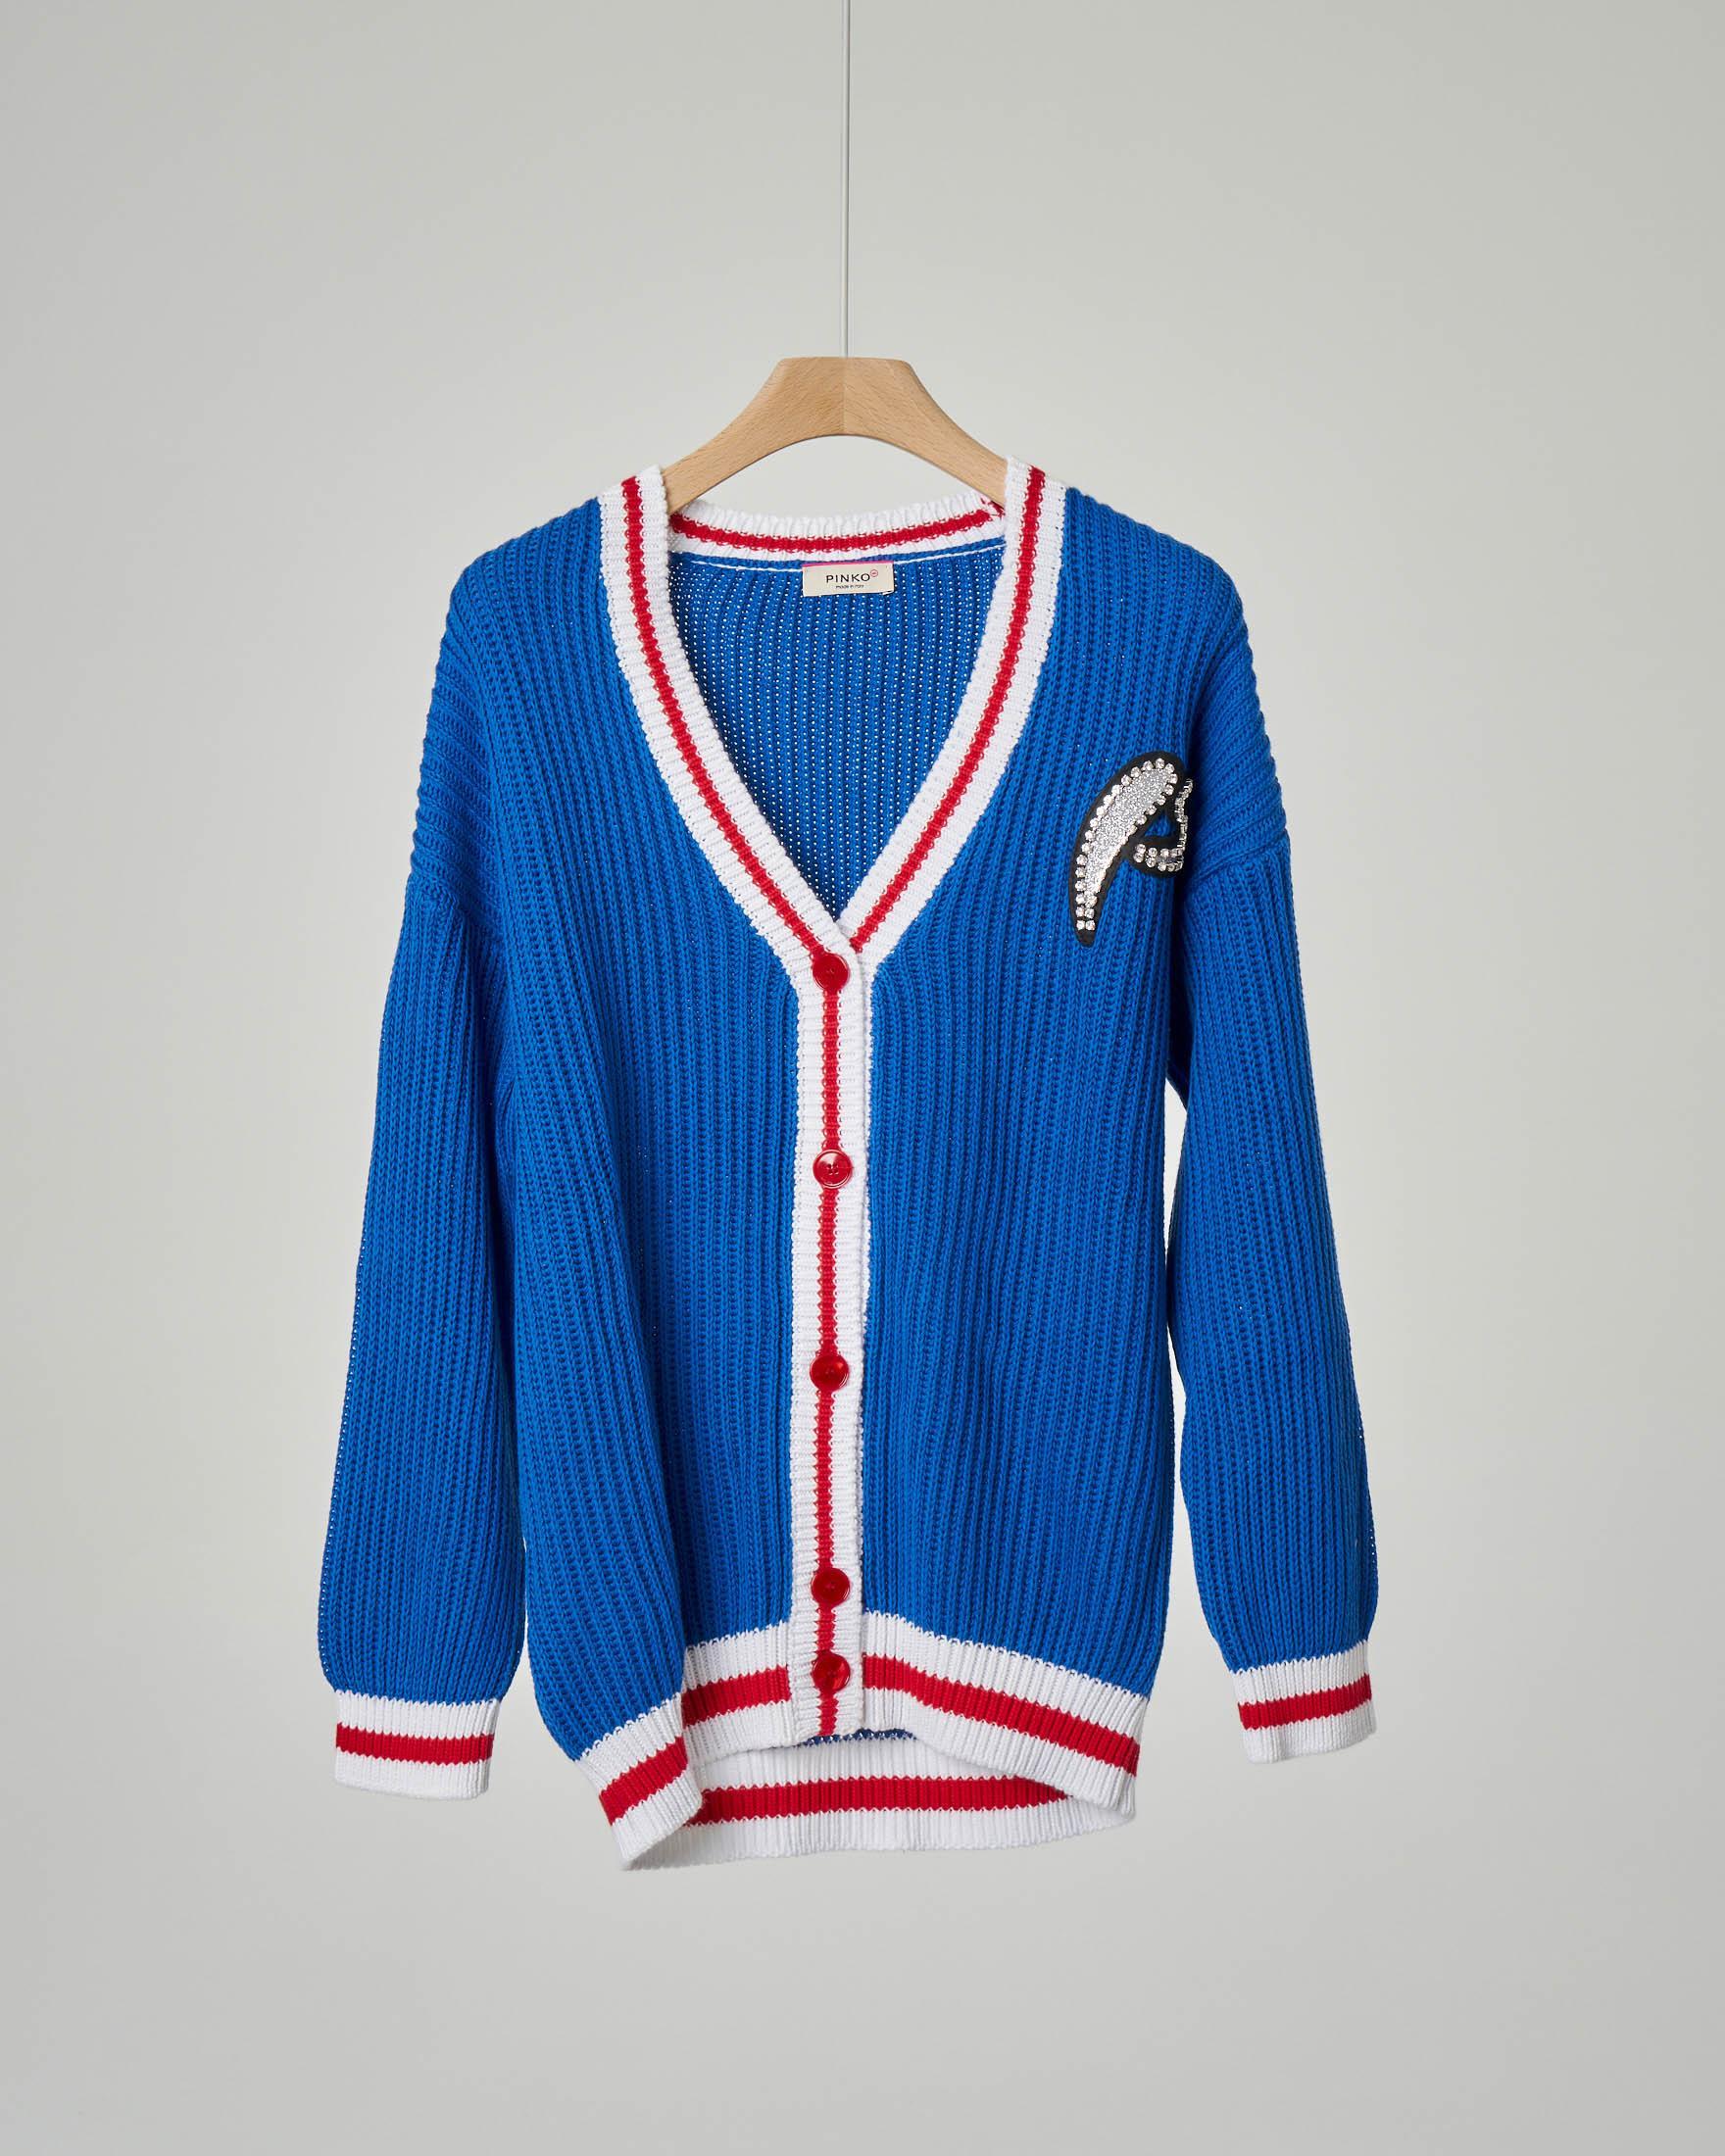 Maglia cardigan blu royal stile college